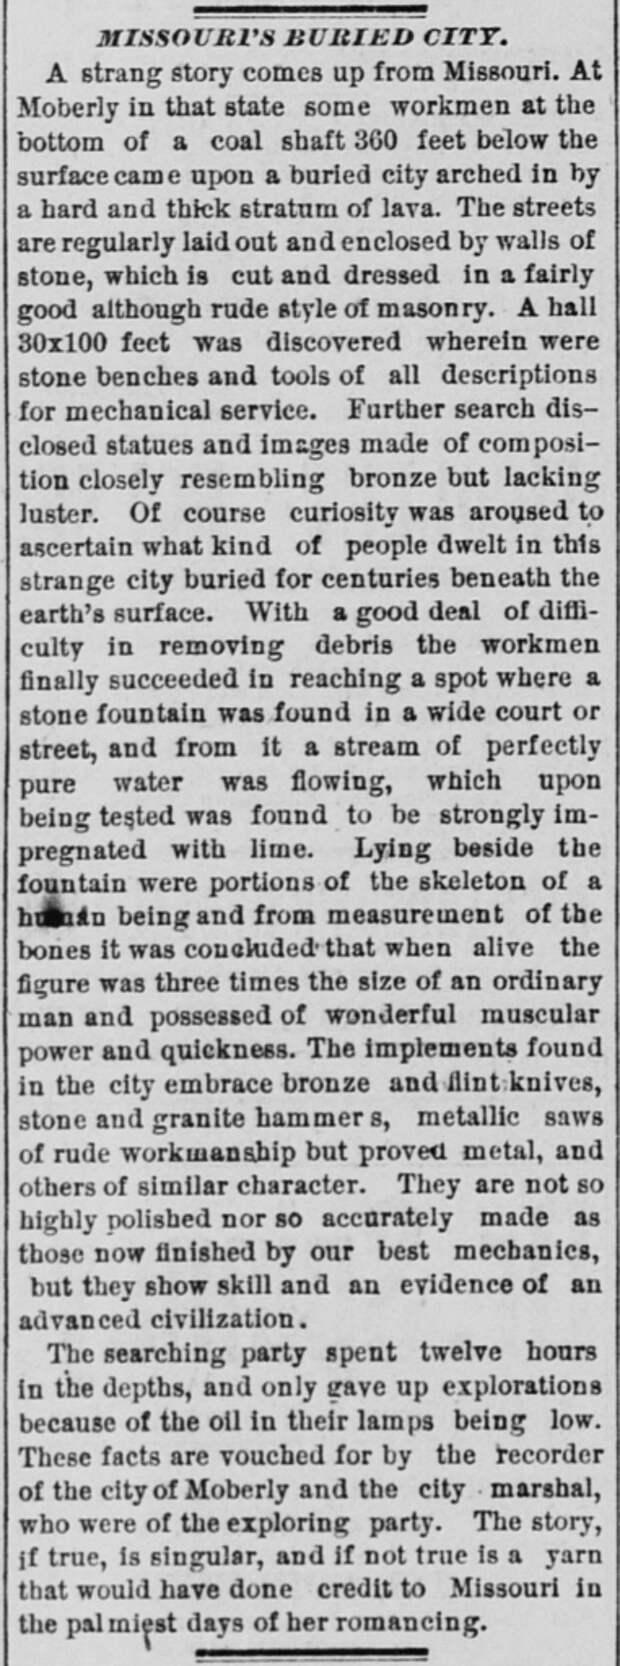 St.-Paul-daily-globe.-April-14-1885-SM-Kristan-T-Harris-381x1024